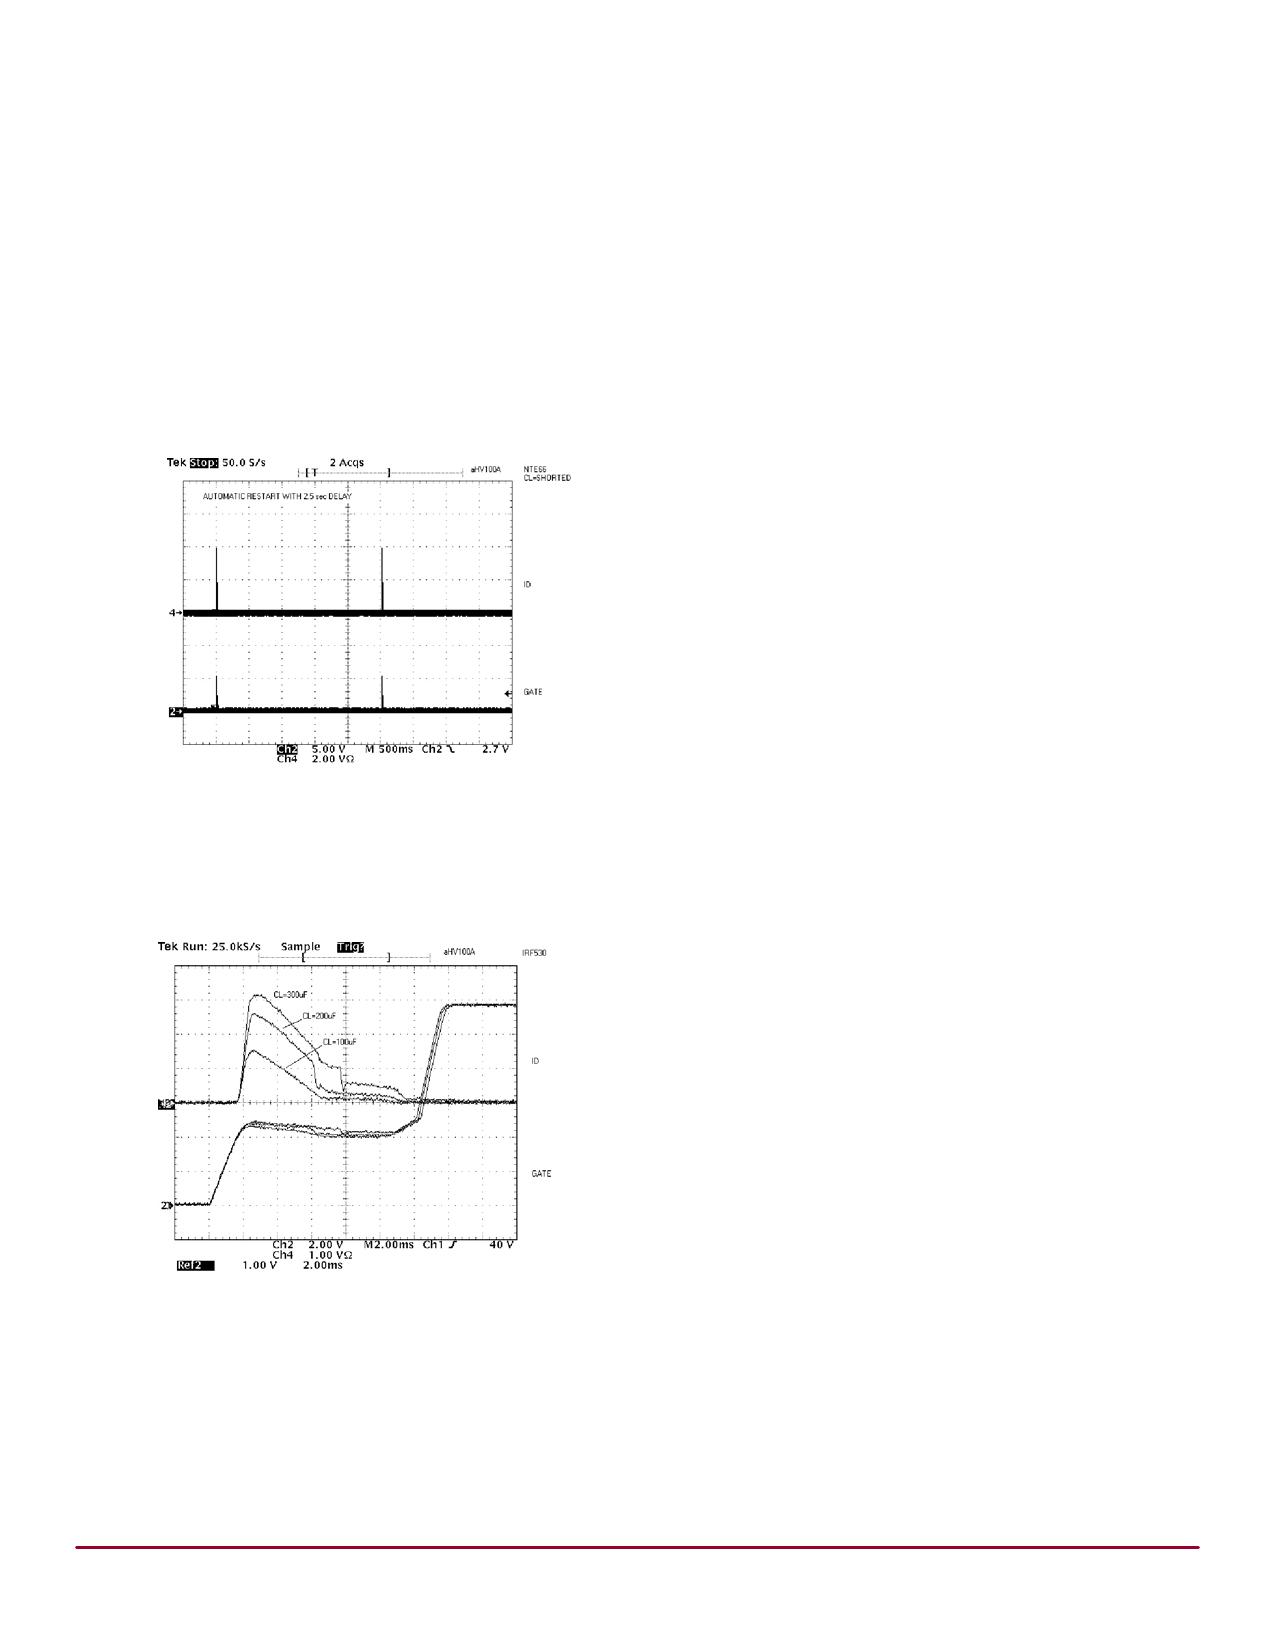 HV100K5-G 電子部品, 半導体